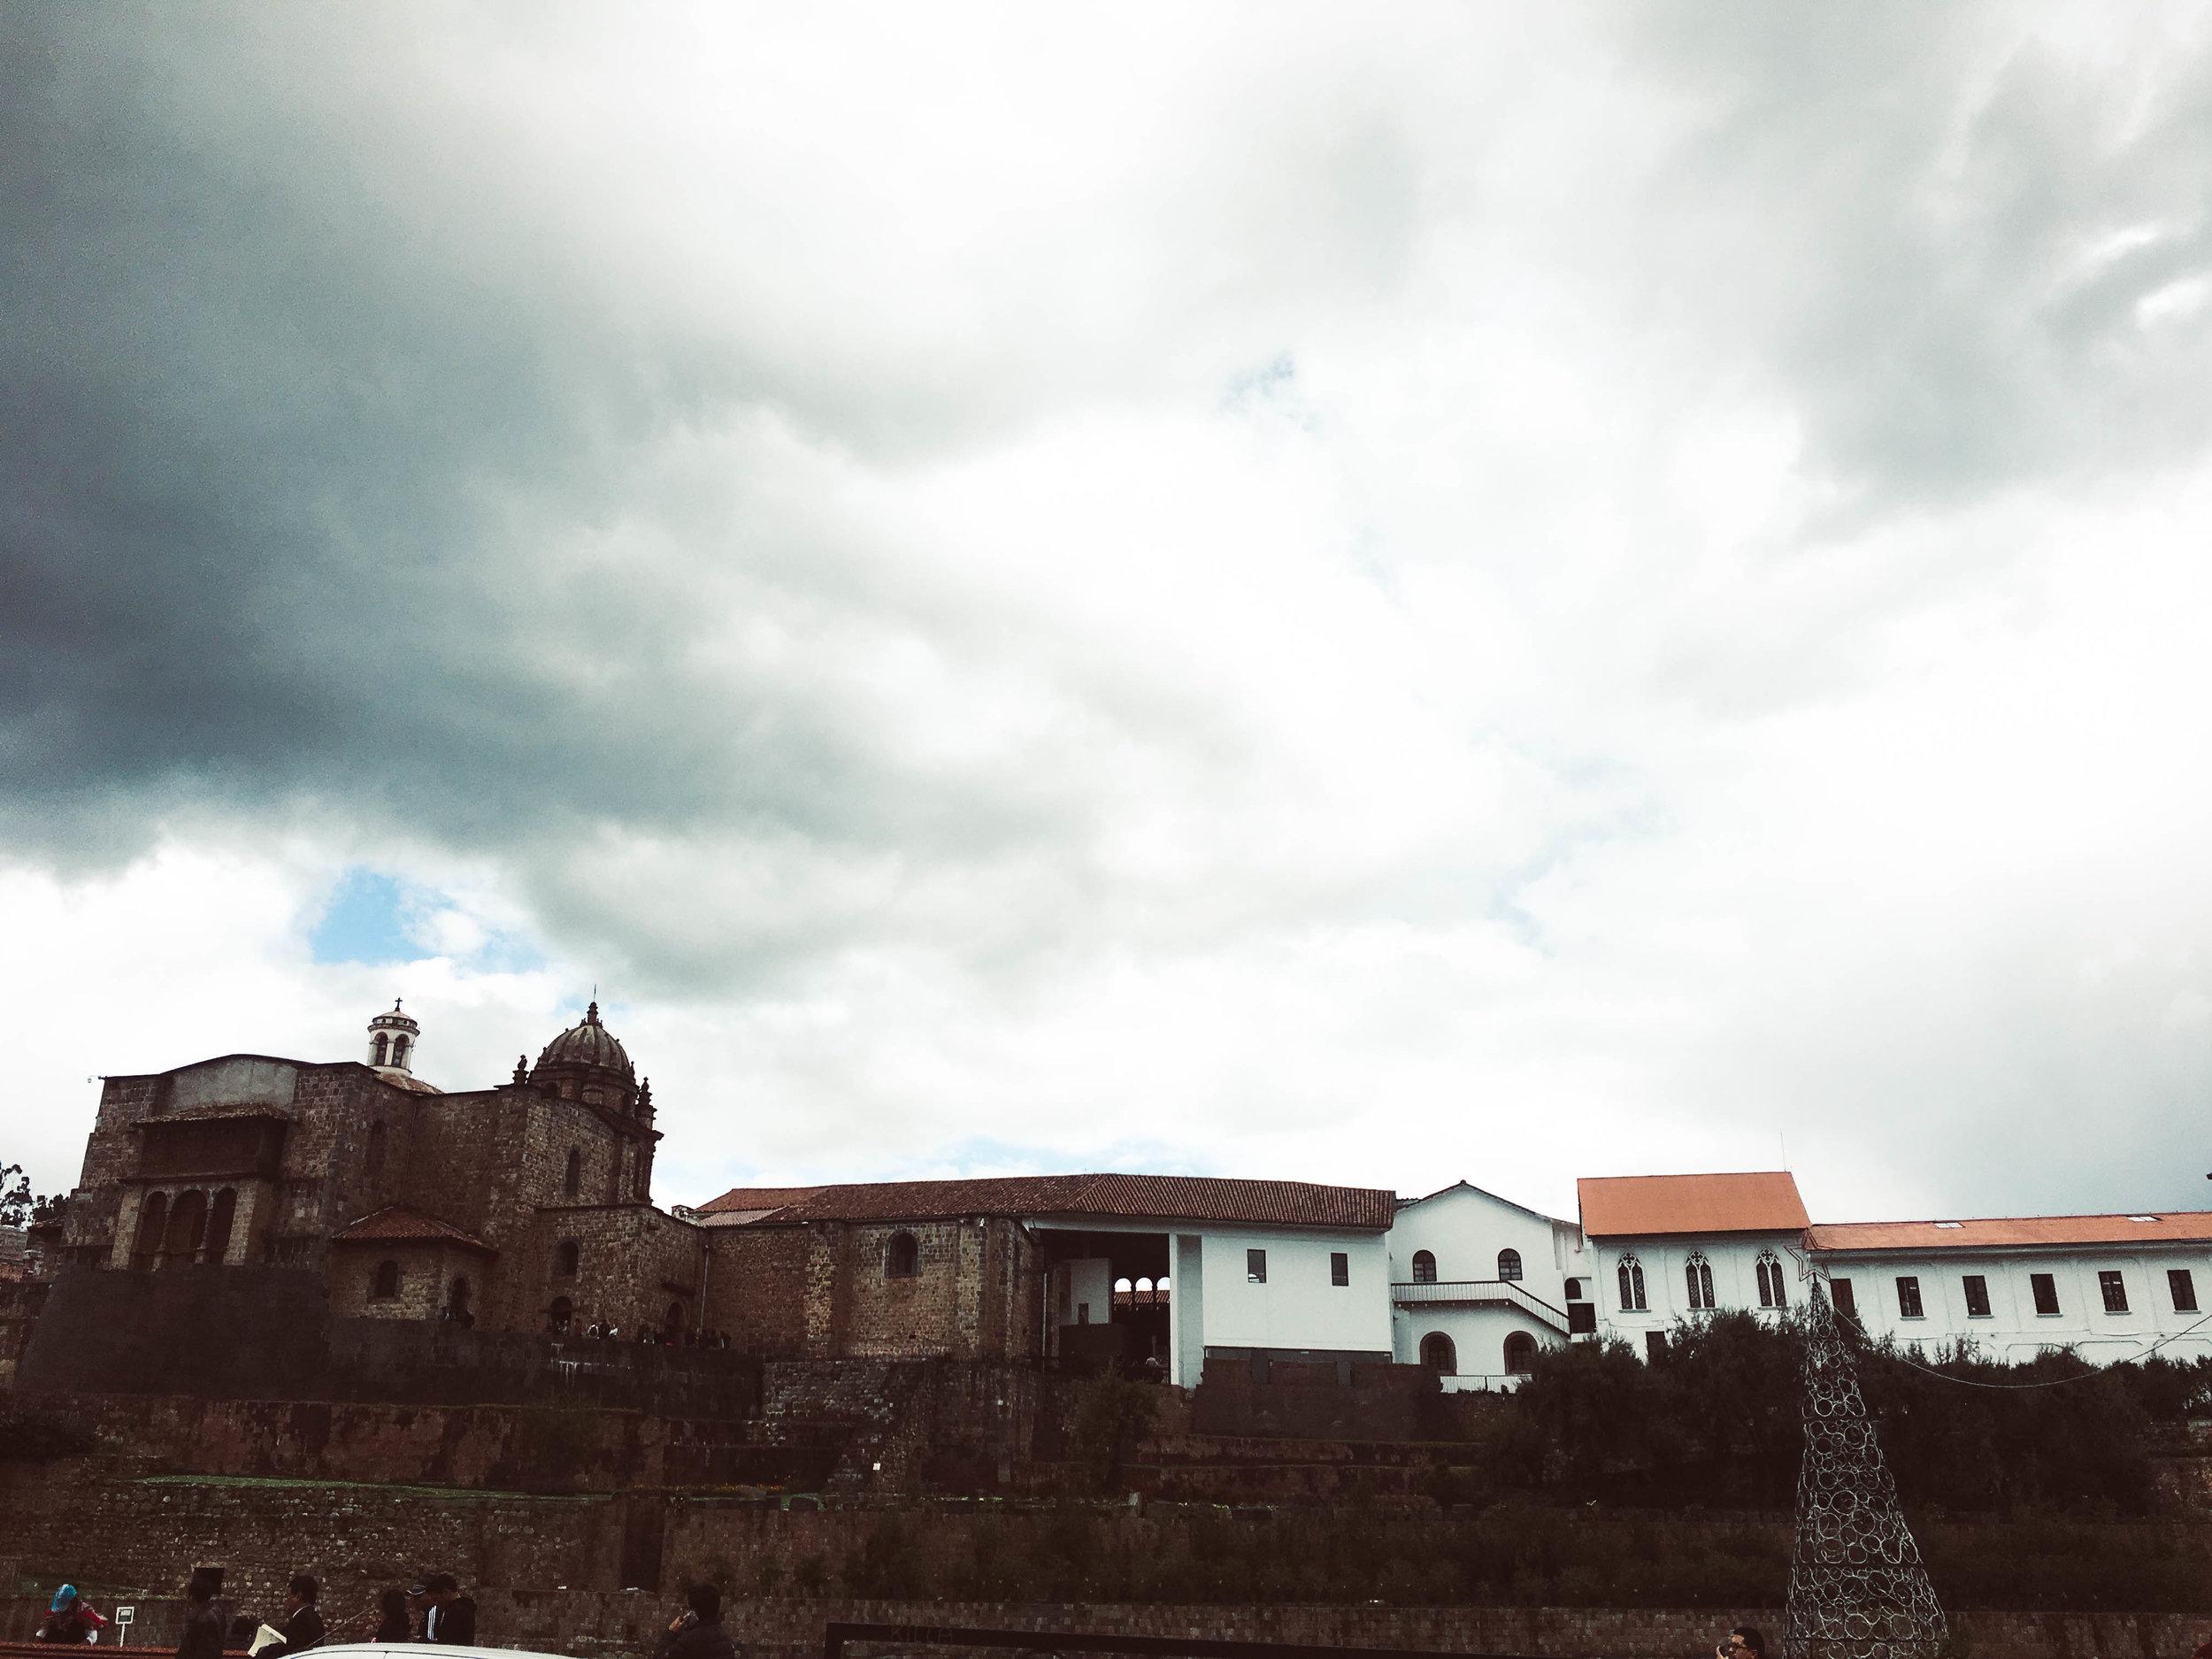 Qurikancha ruins and museum